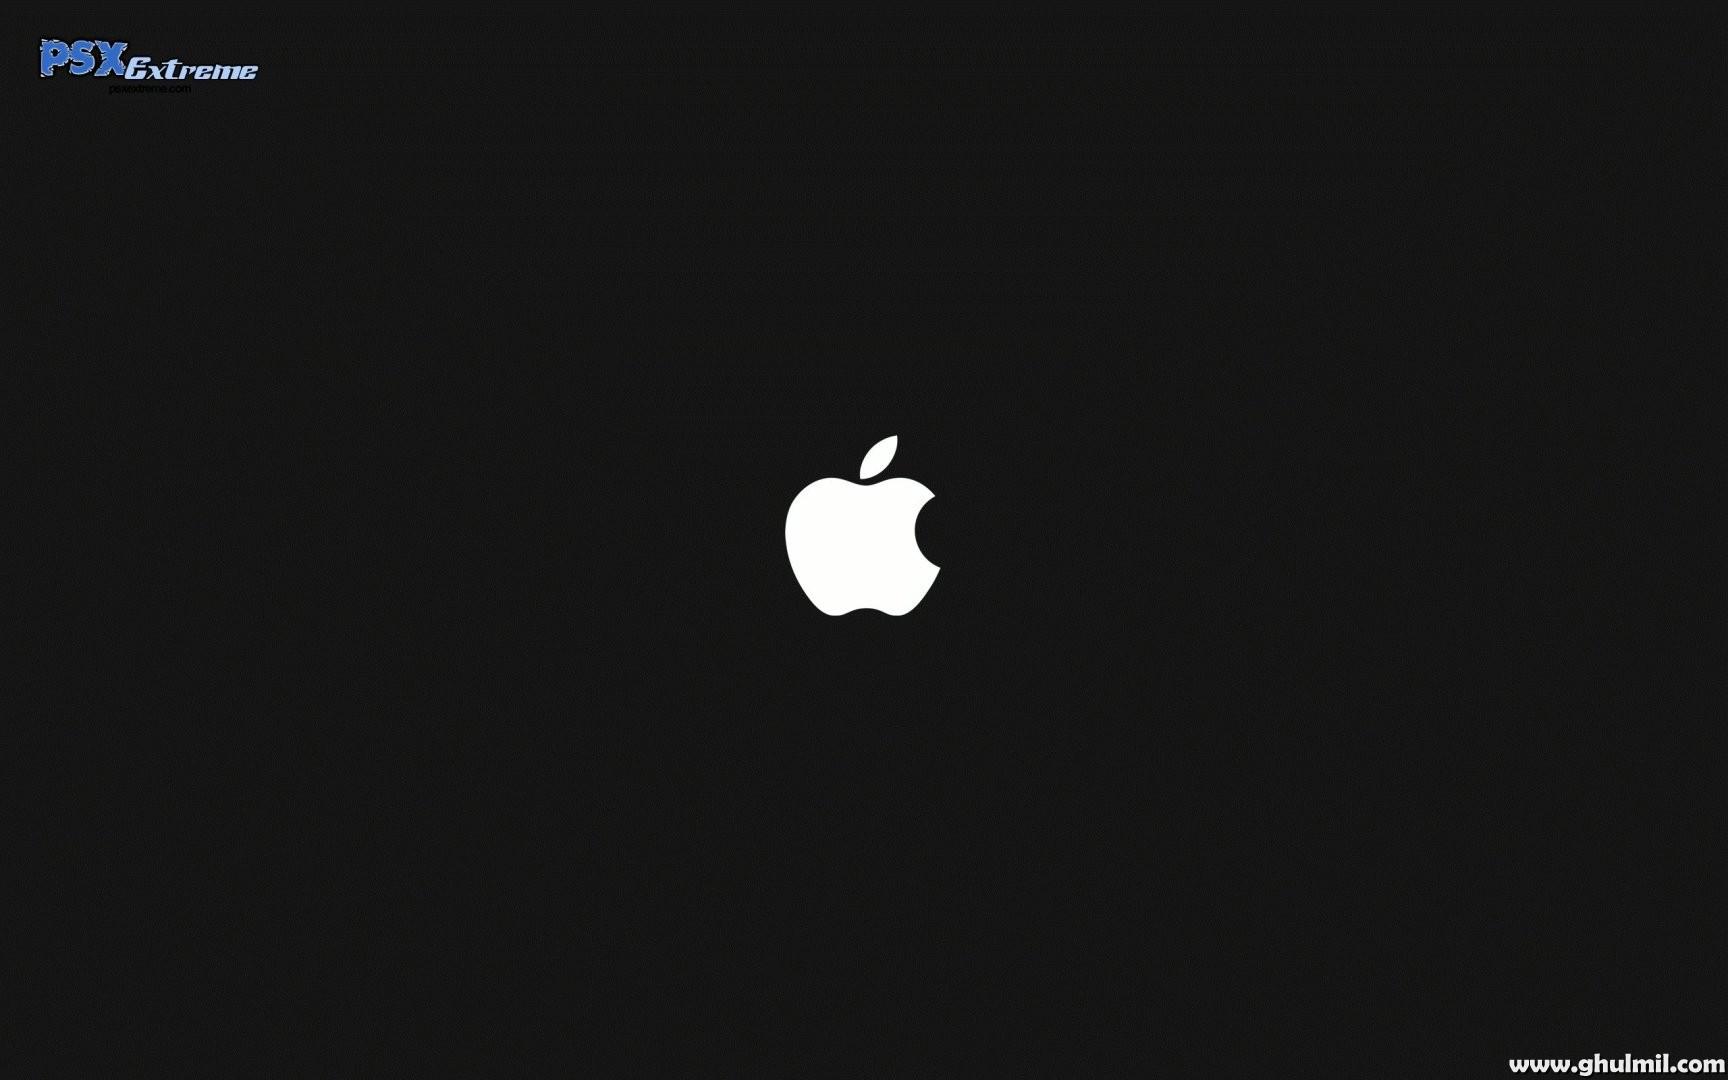 High Quality HD High Resolution Mac Apple Wallpaper 1728x1080